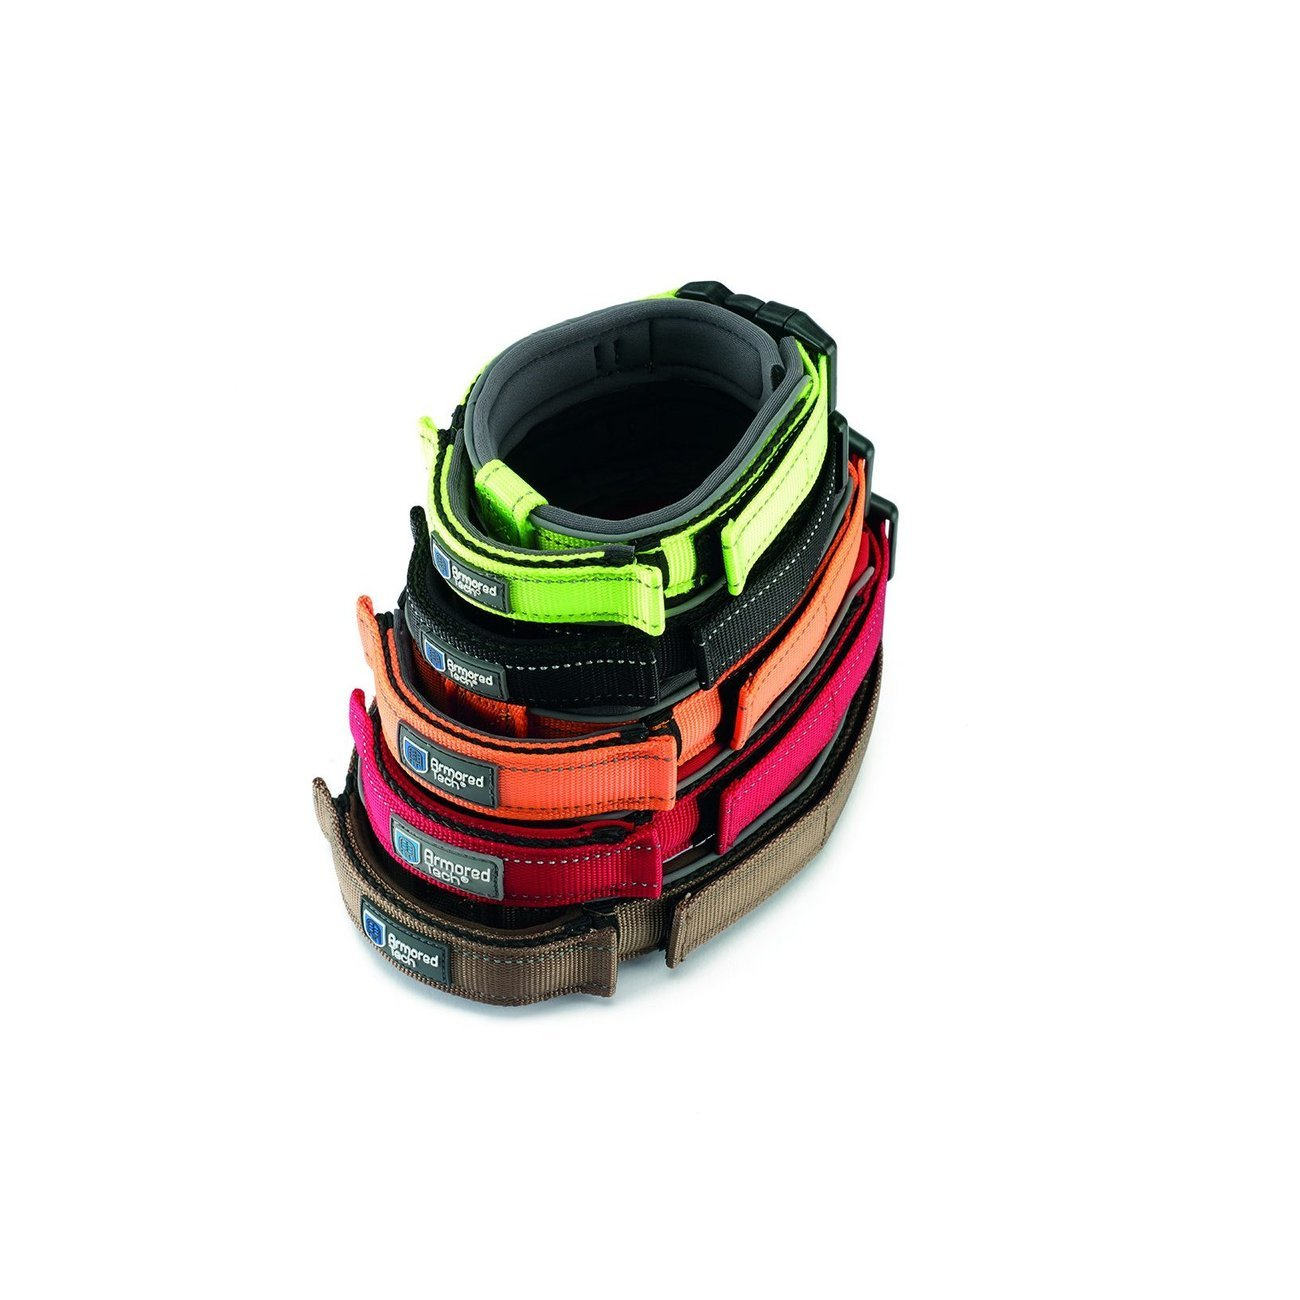 Armored Tech ArmoredTech Hundehalsband